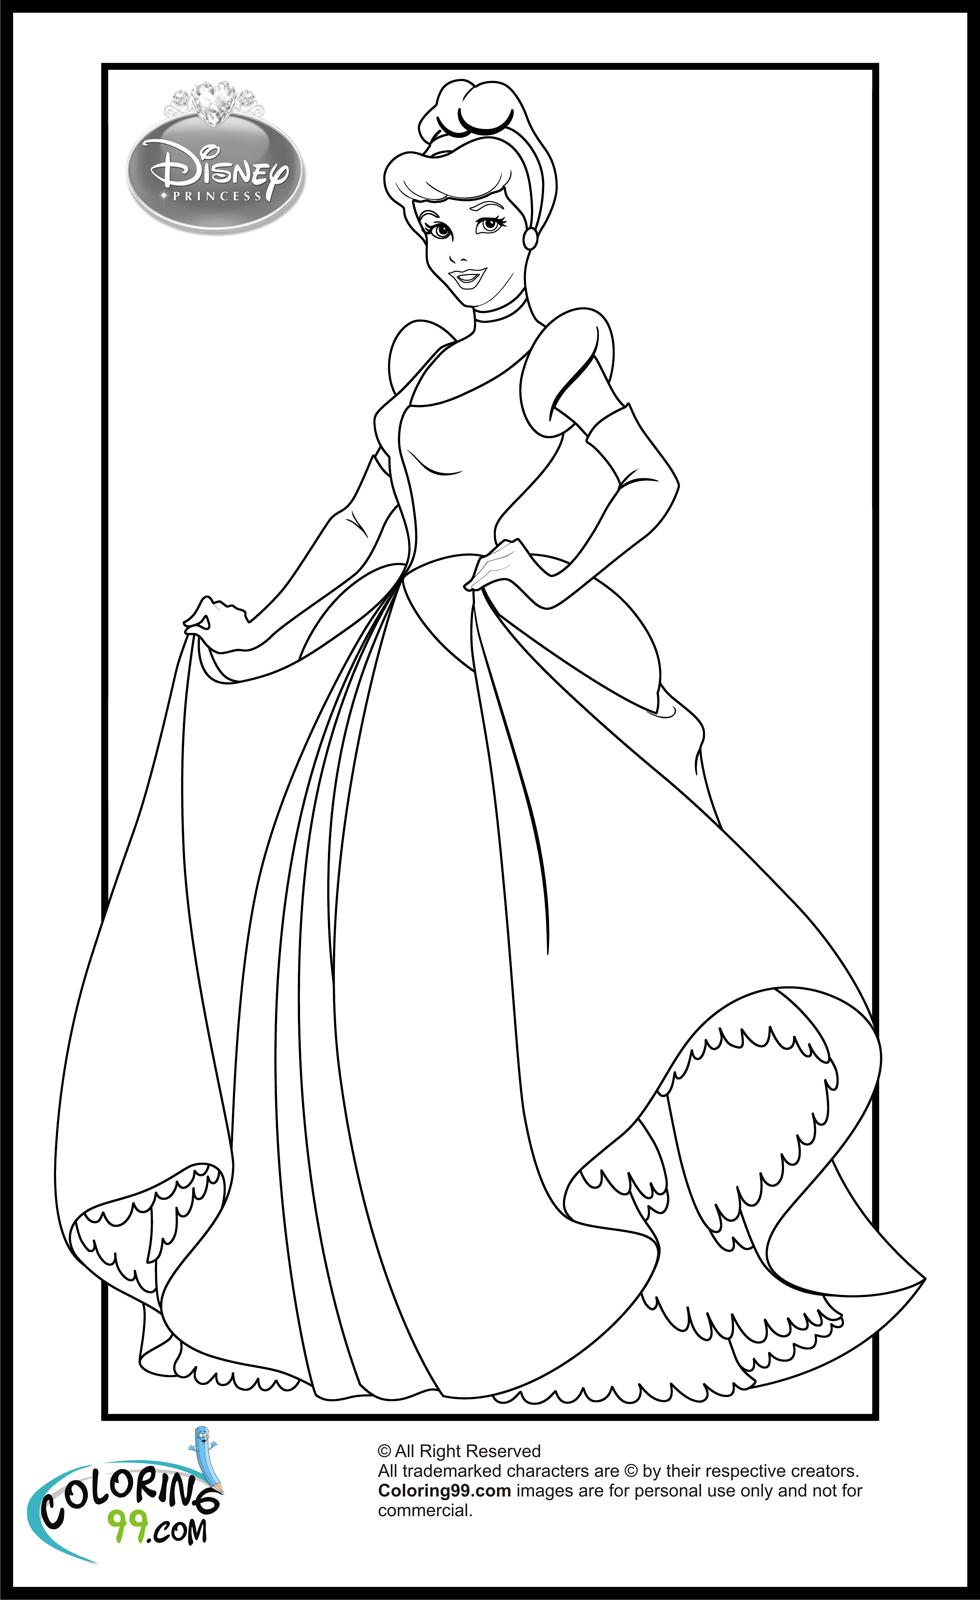 disney princess coloring sheets disney princess coloring pages team colors sheets coloring princess disney